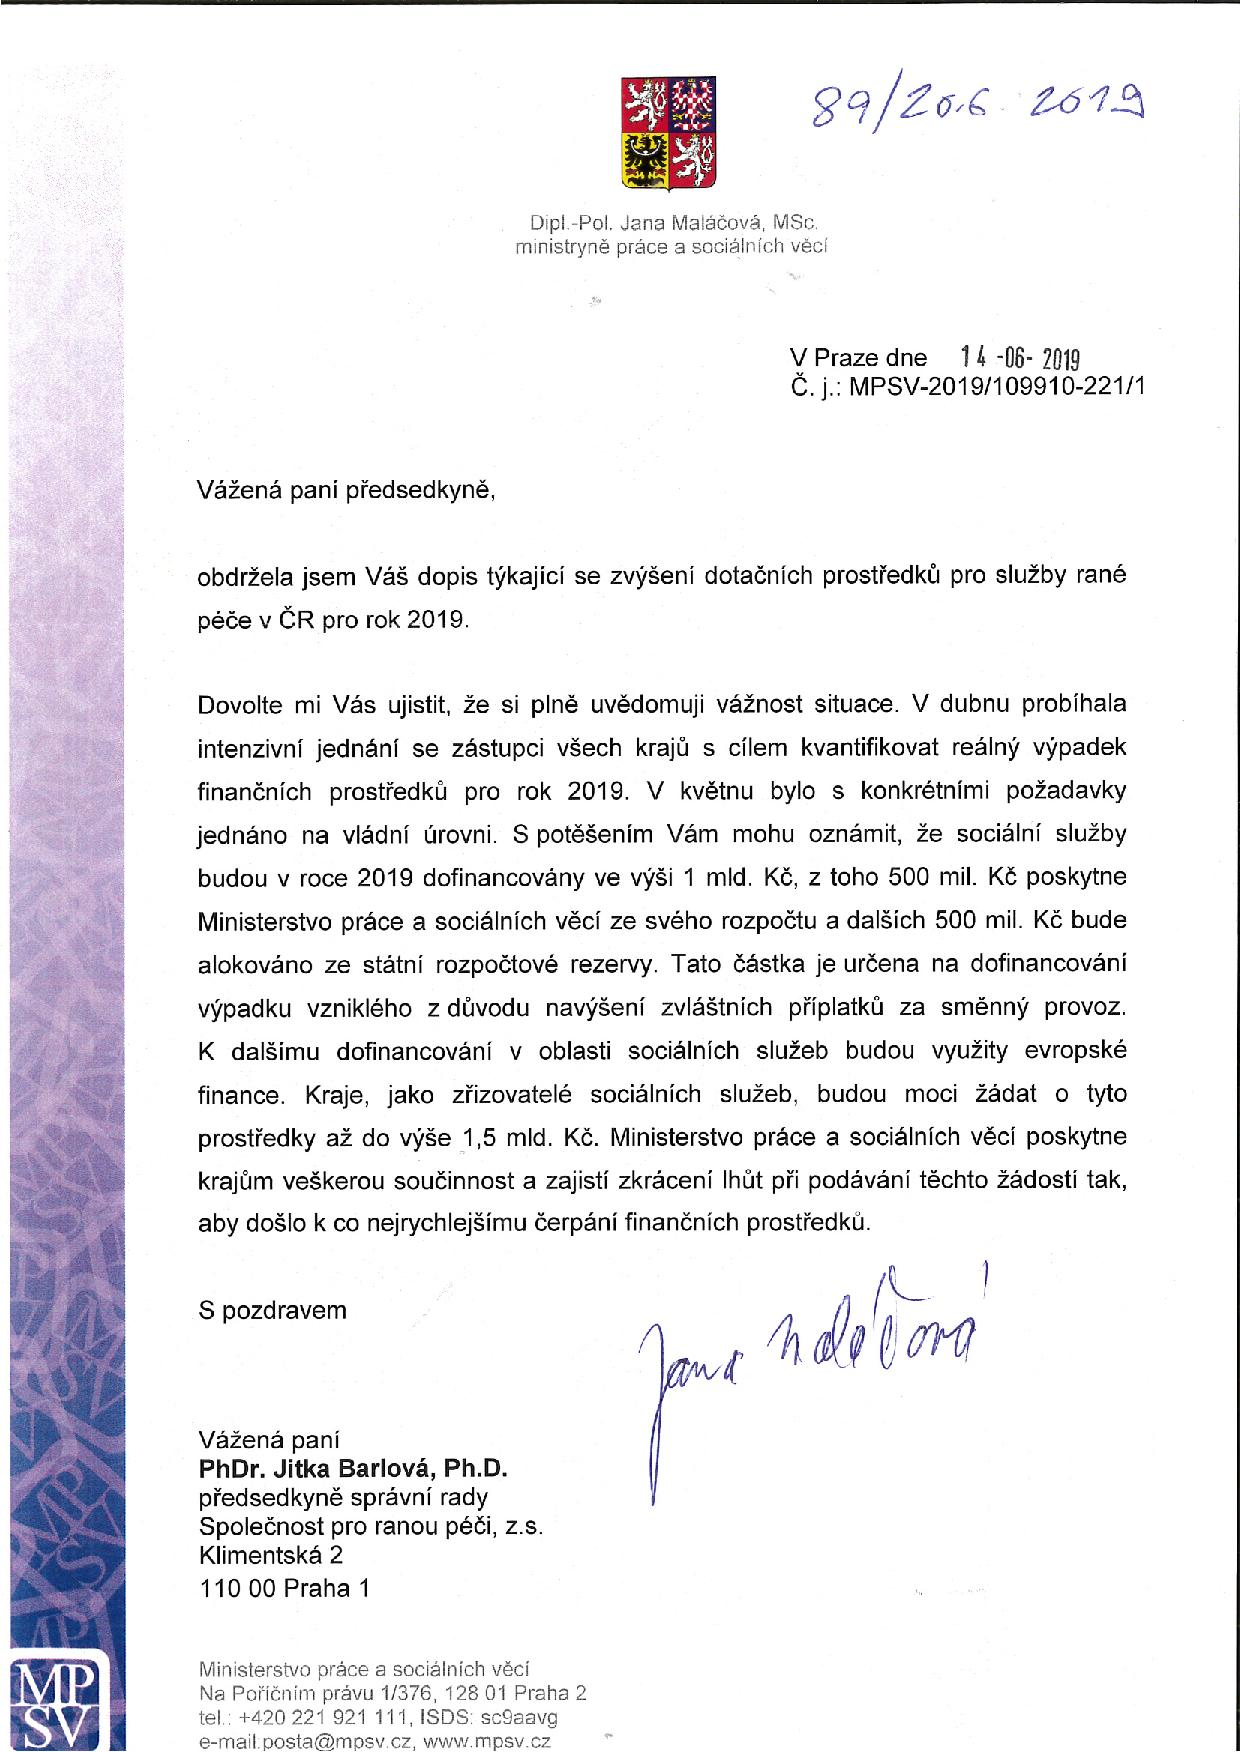 dopis ministryne